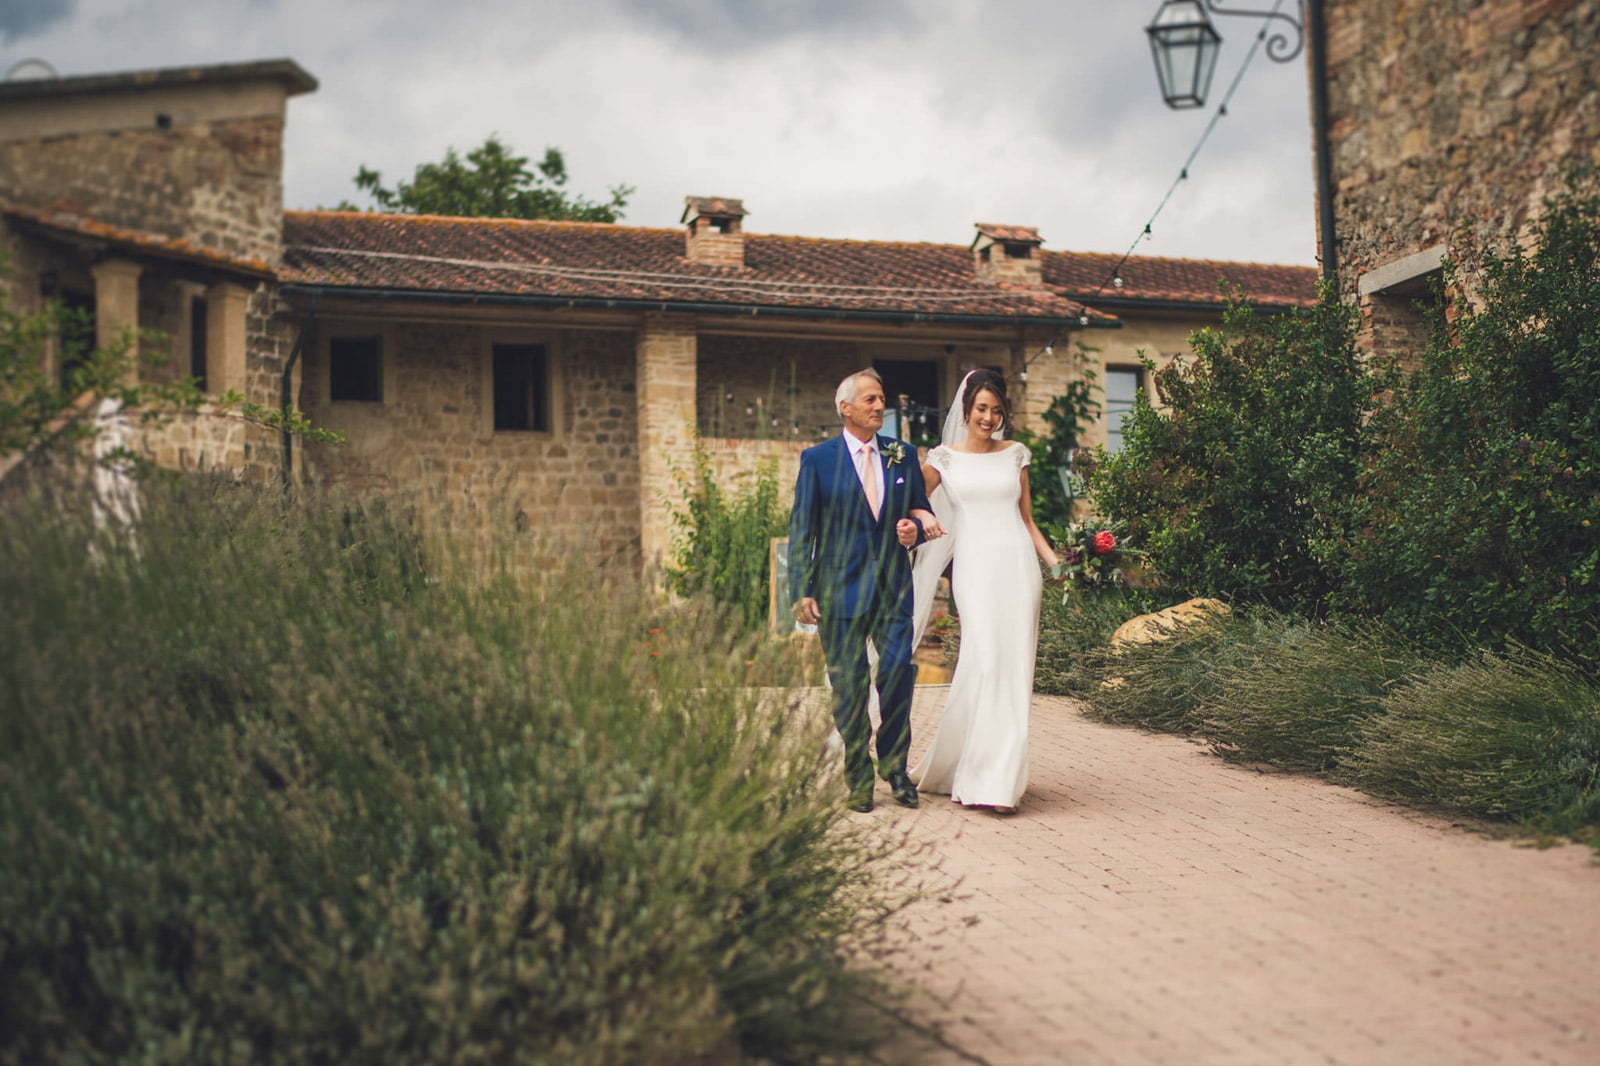 045-wedding-tuscany-san-galgano-federico-pannacci-photographer